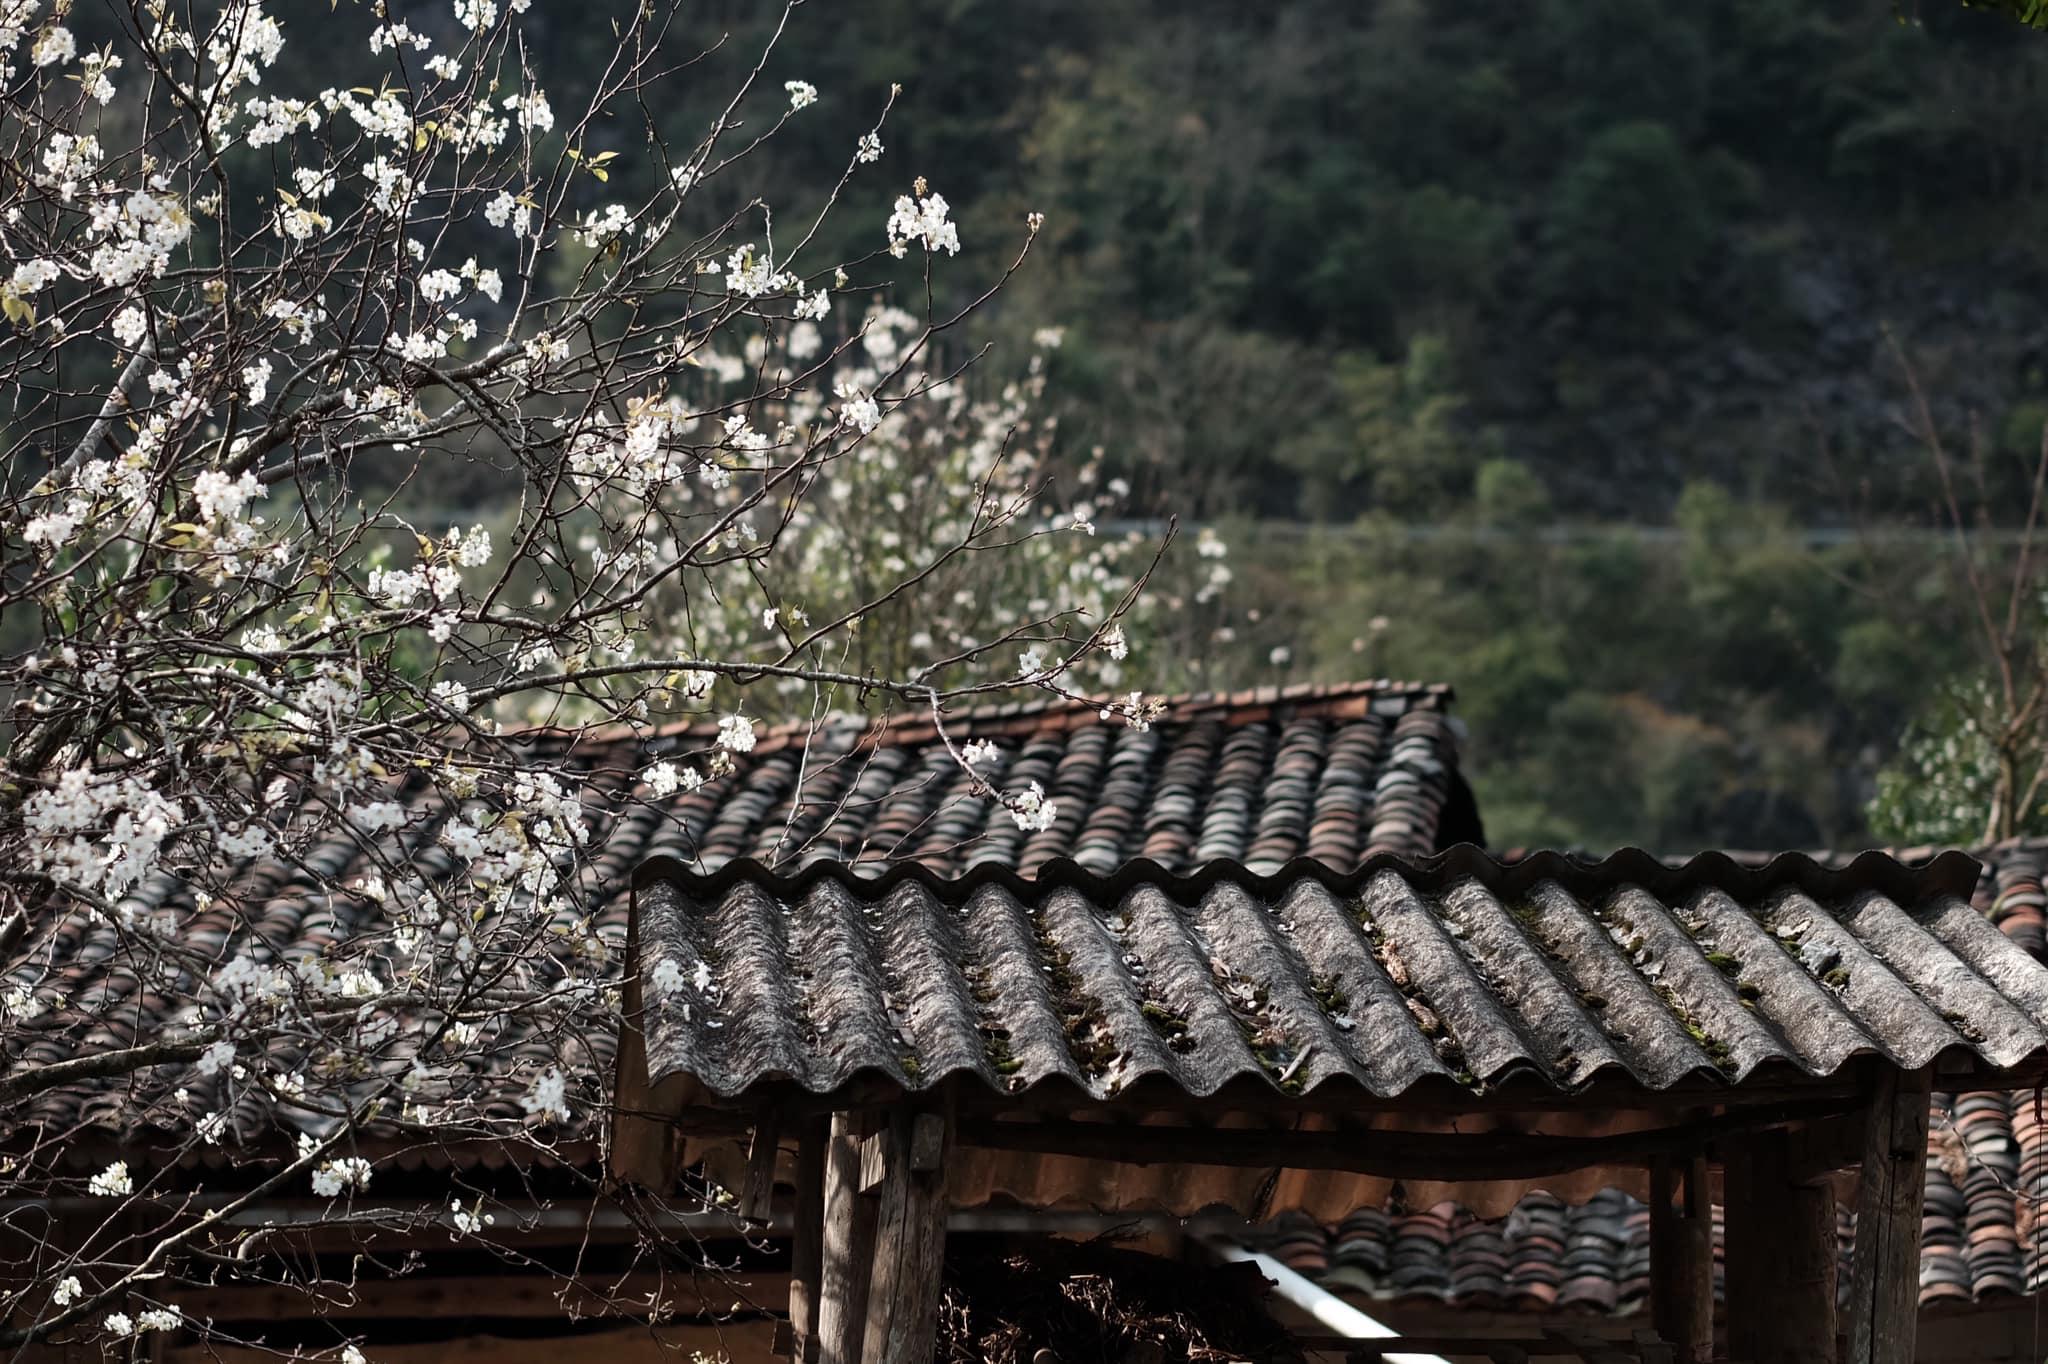 Hoa mận. Hình: Thuận